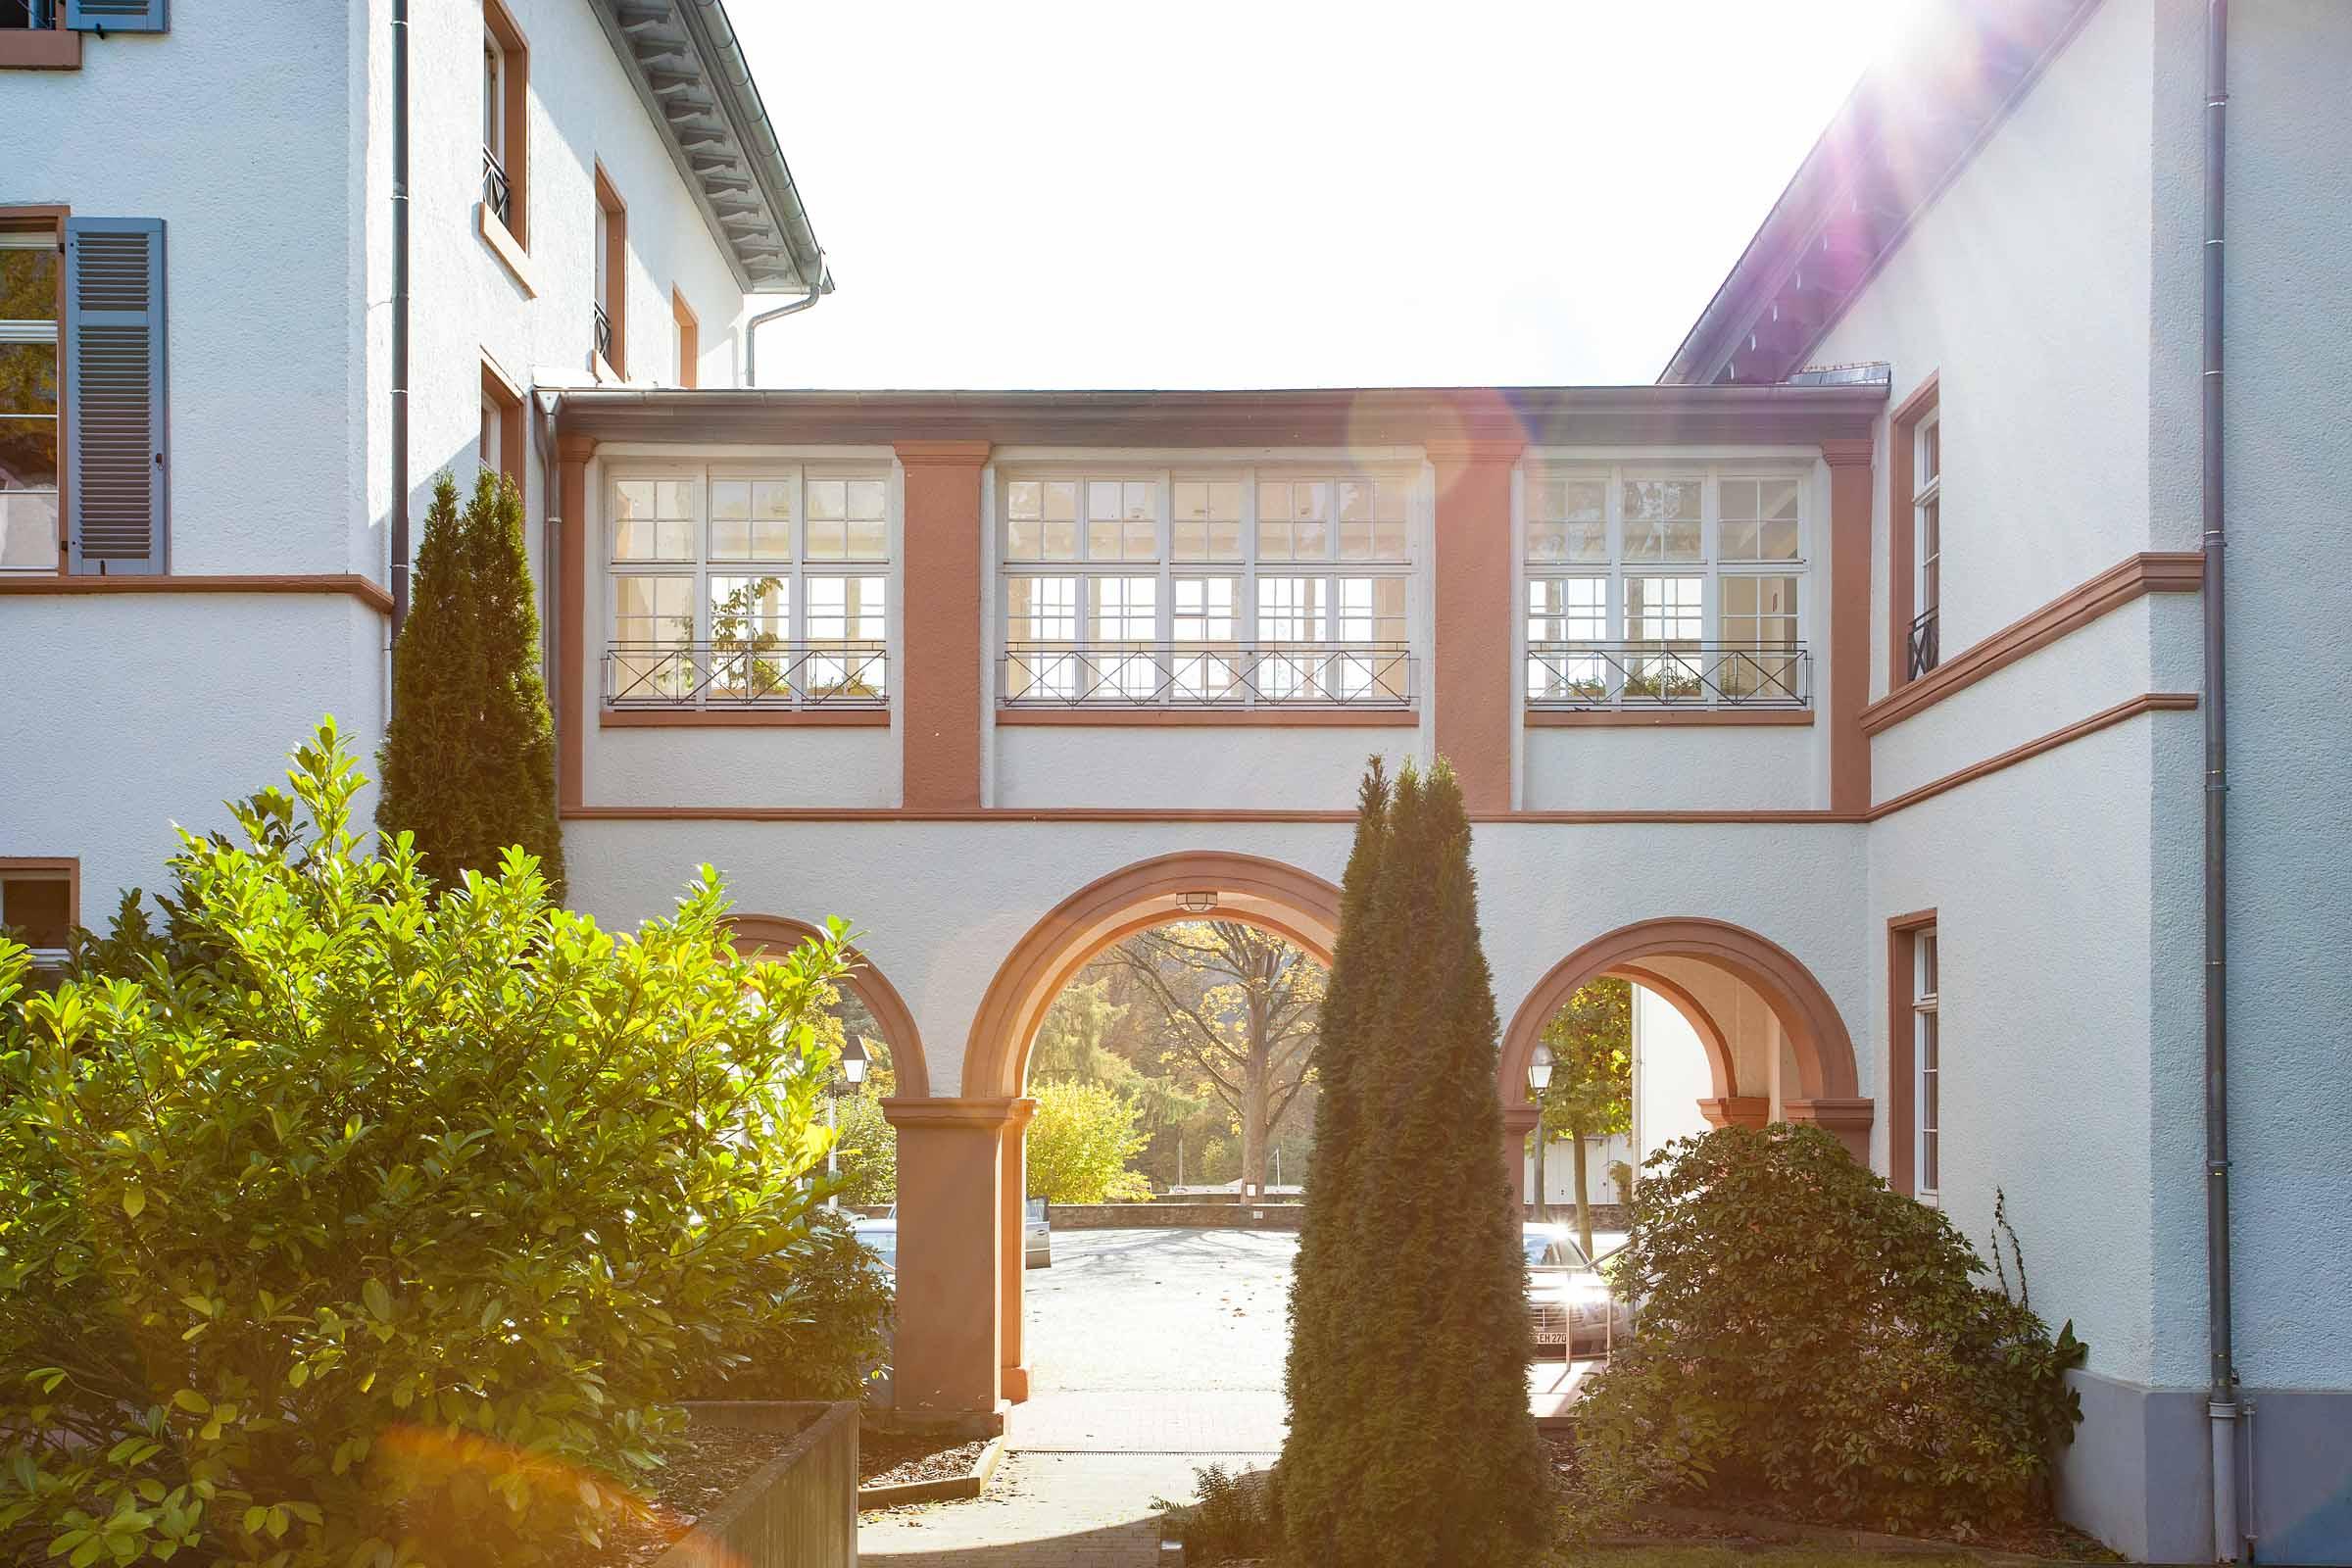 Kurhaus Hotel Bad Salzhausen Historische Hausverbindung